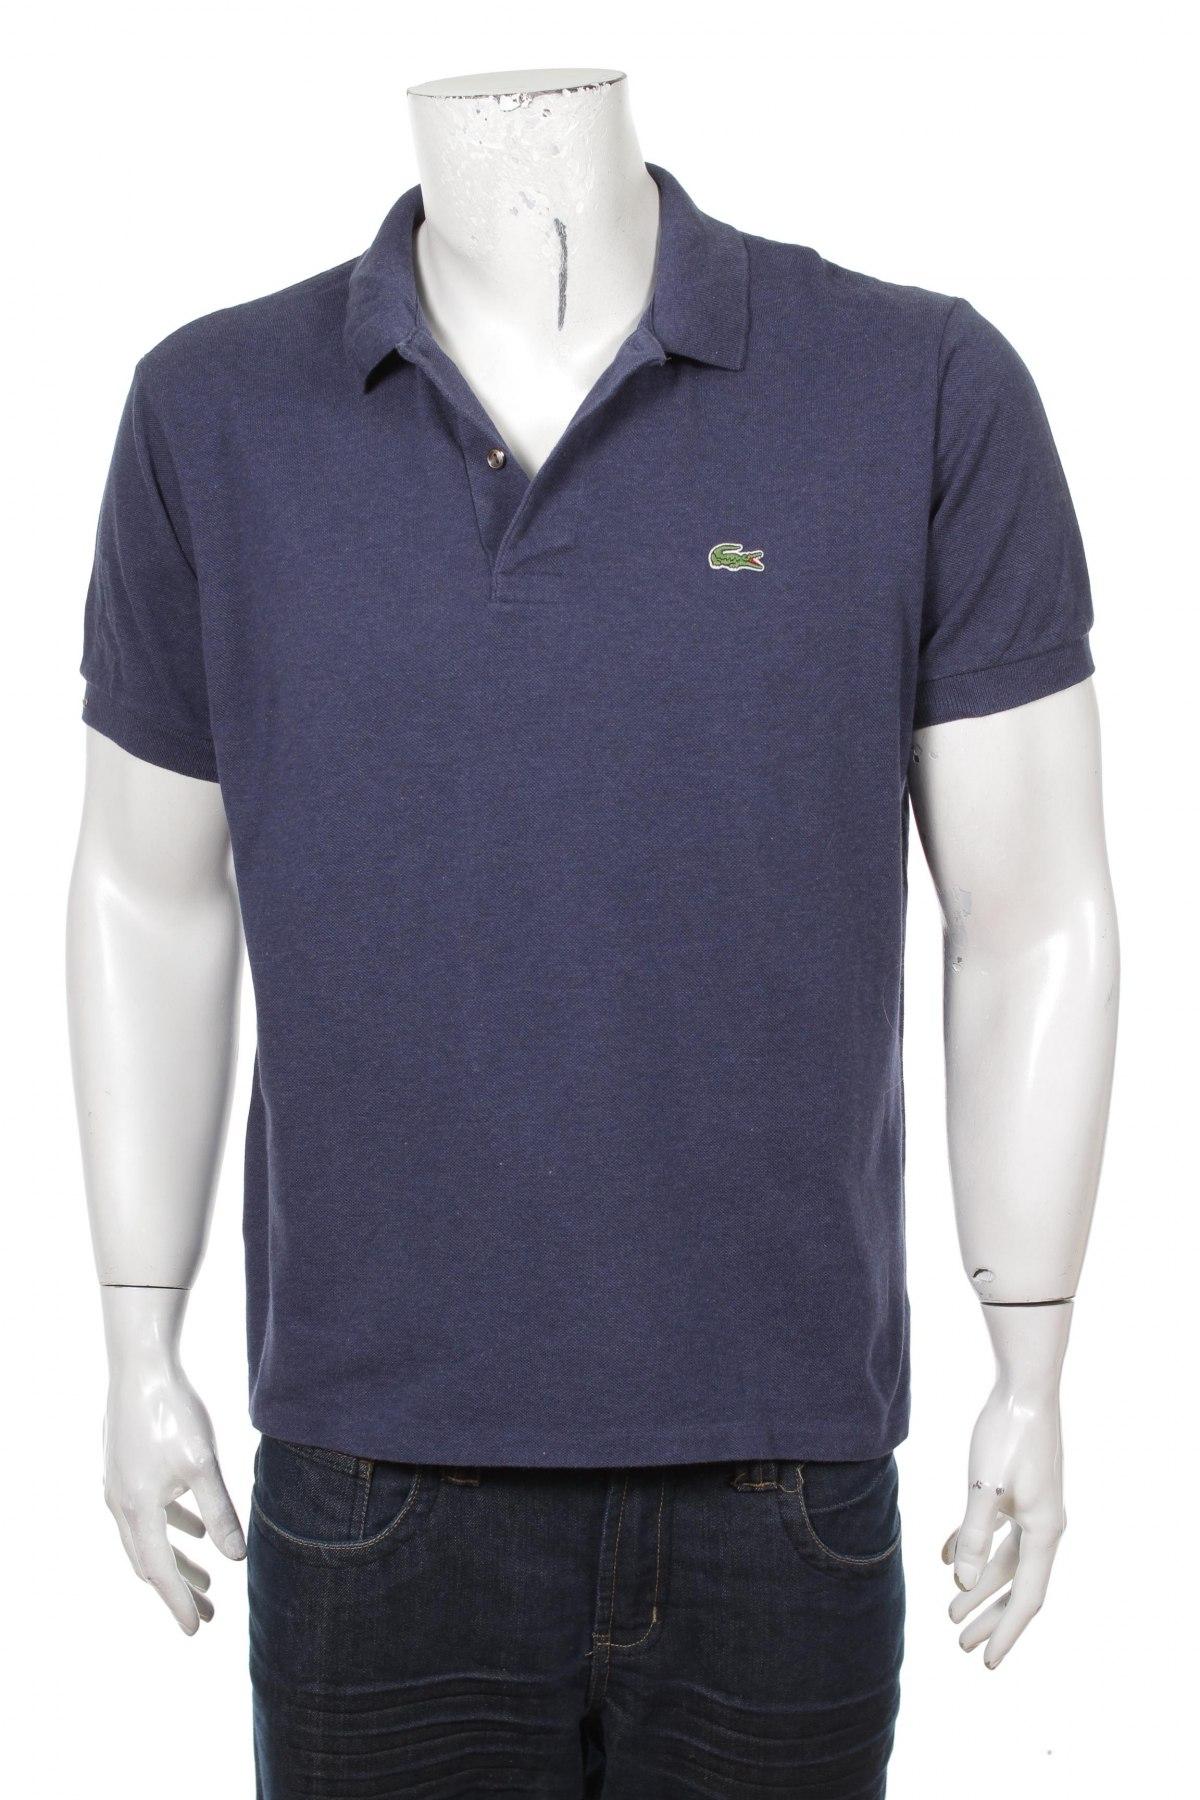 bd9e9f974f4c Ανδρικό t-shirt Lacoste - σε συμφέρουσα τιμή στο Remix -  8253677